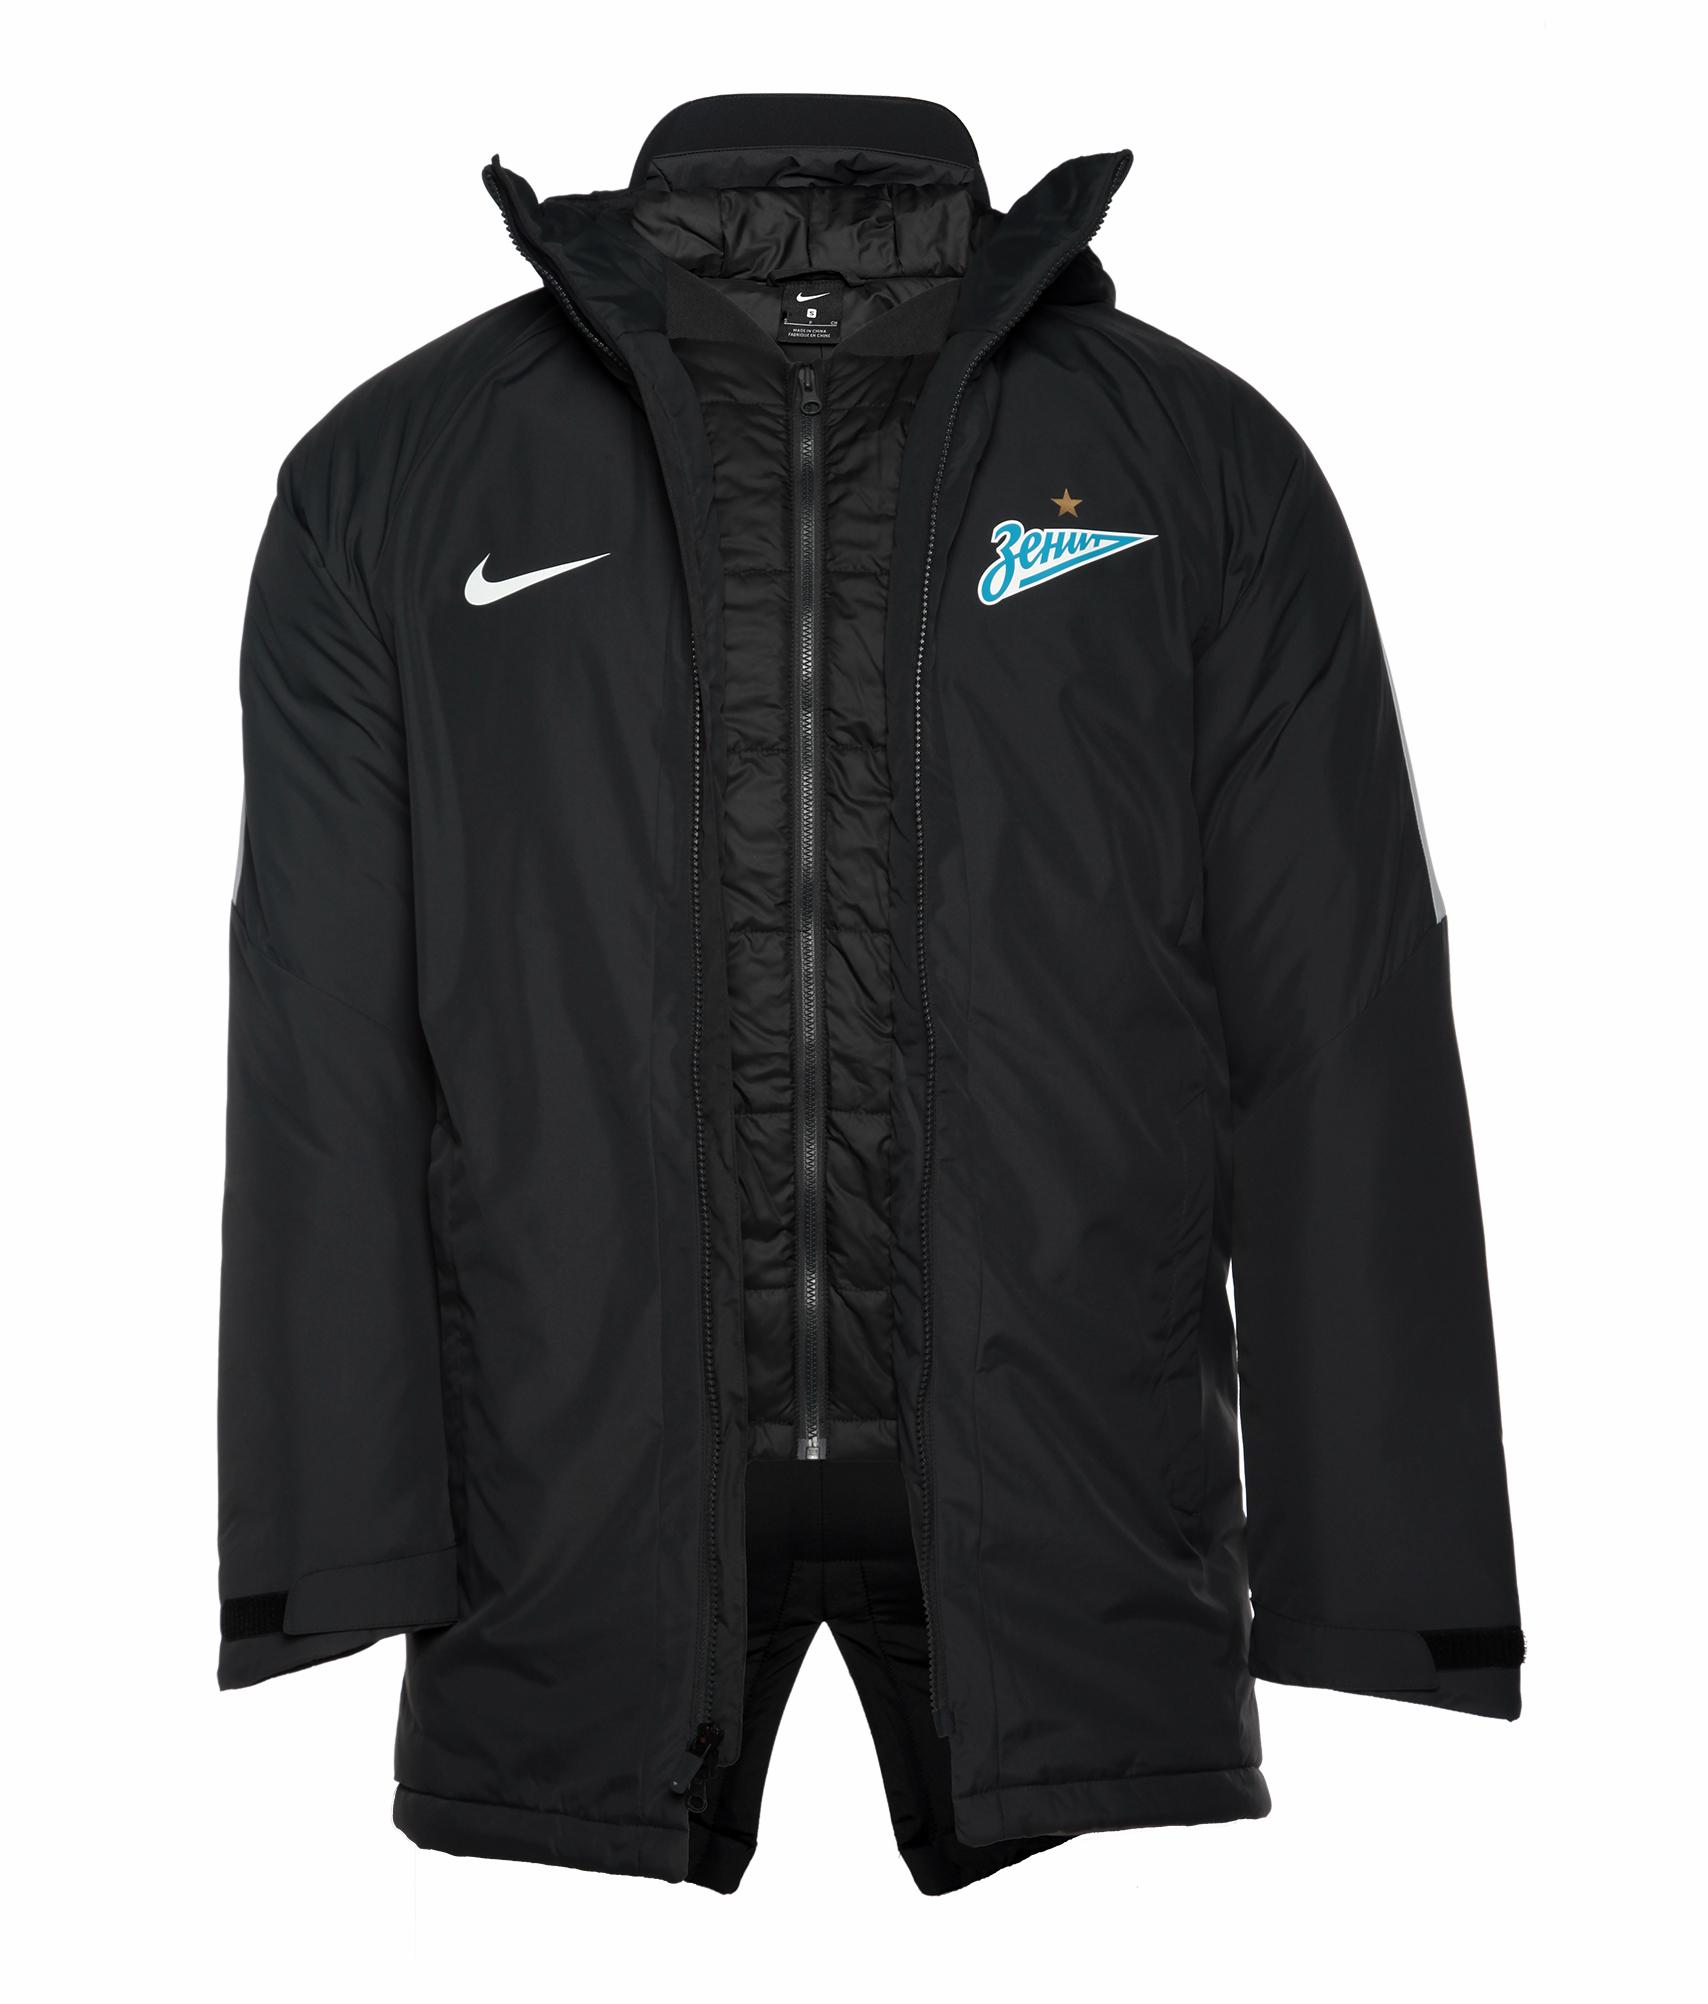 цена на Куртка зимняя Nike, Размер-M